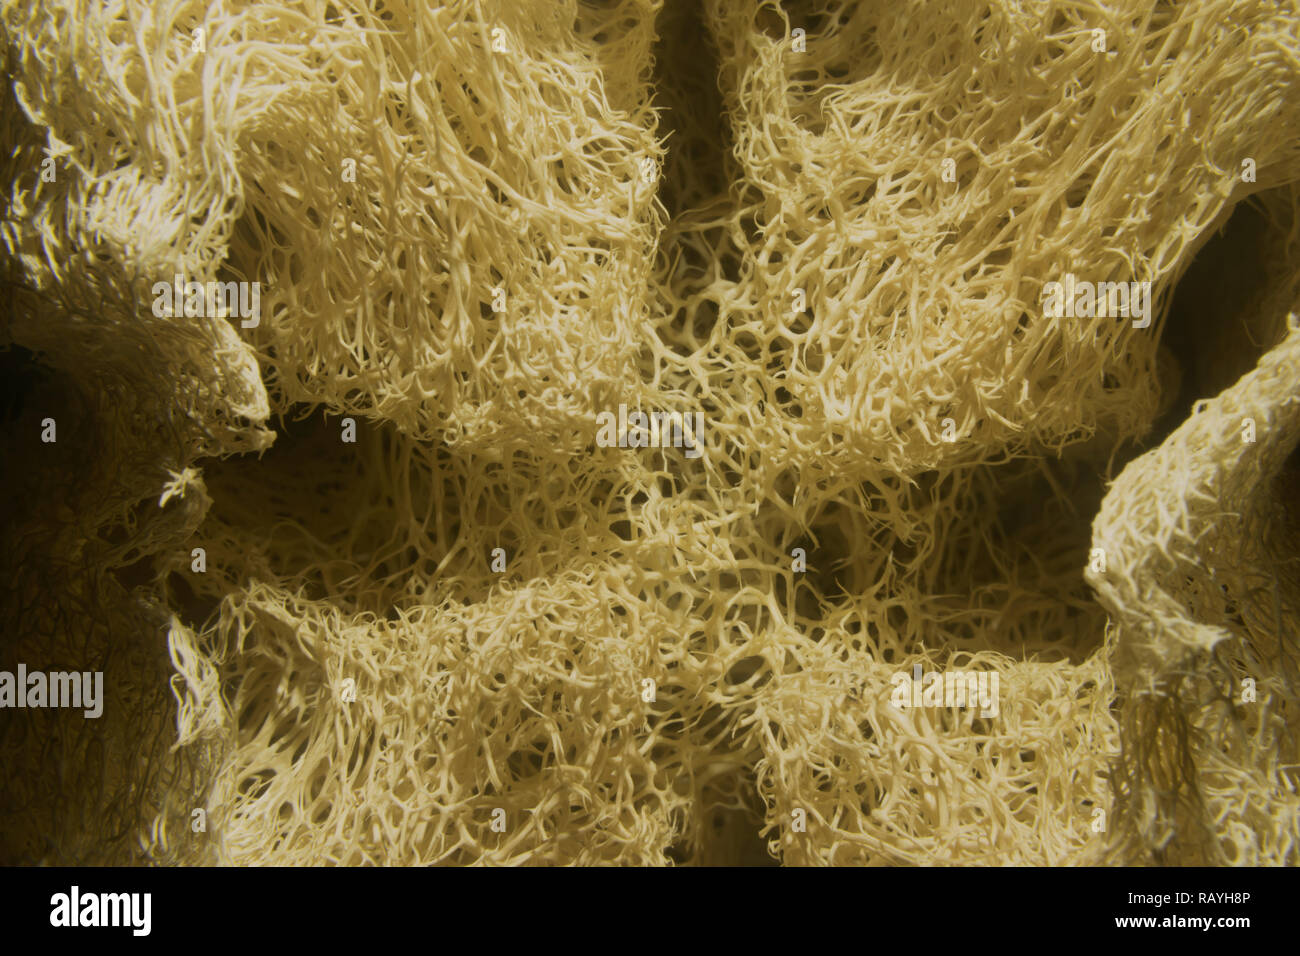 fiber shower,Close-up photography,dry plants - Stock Image